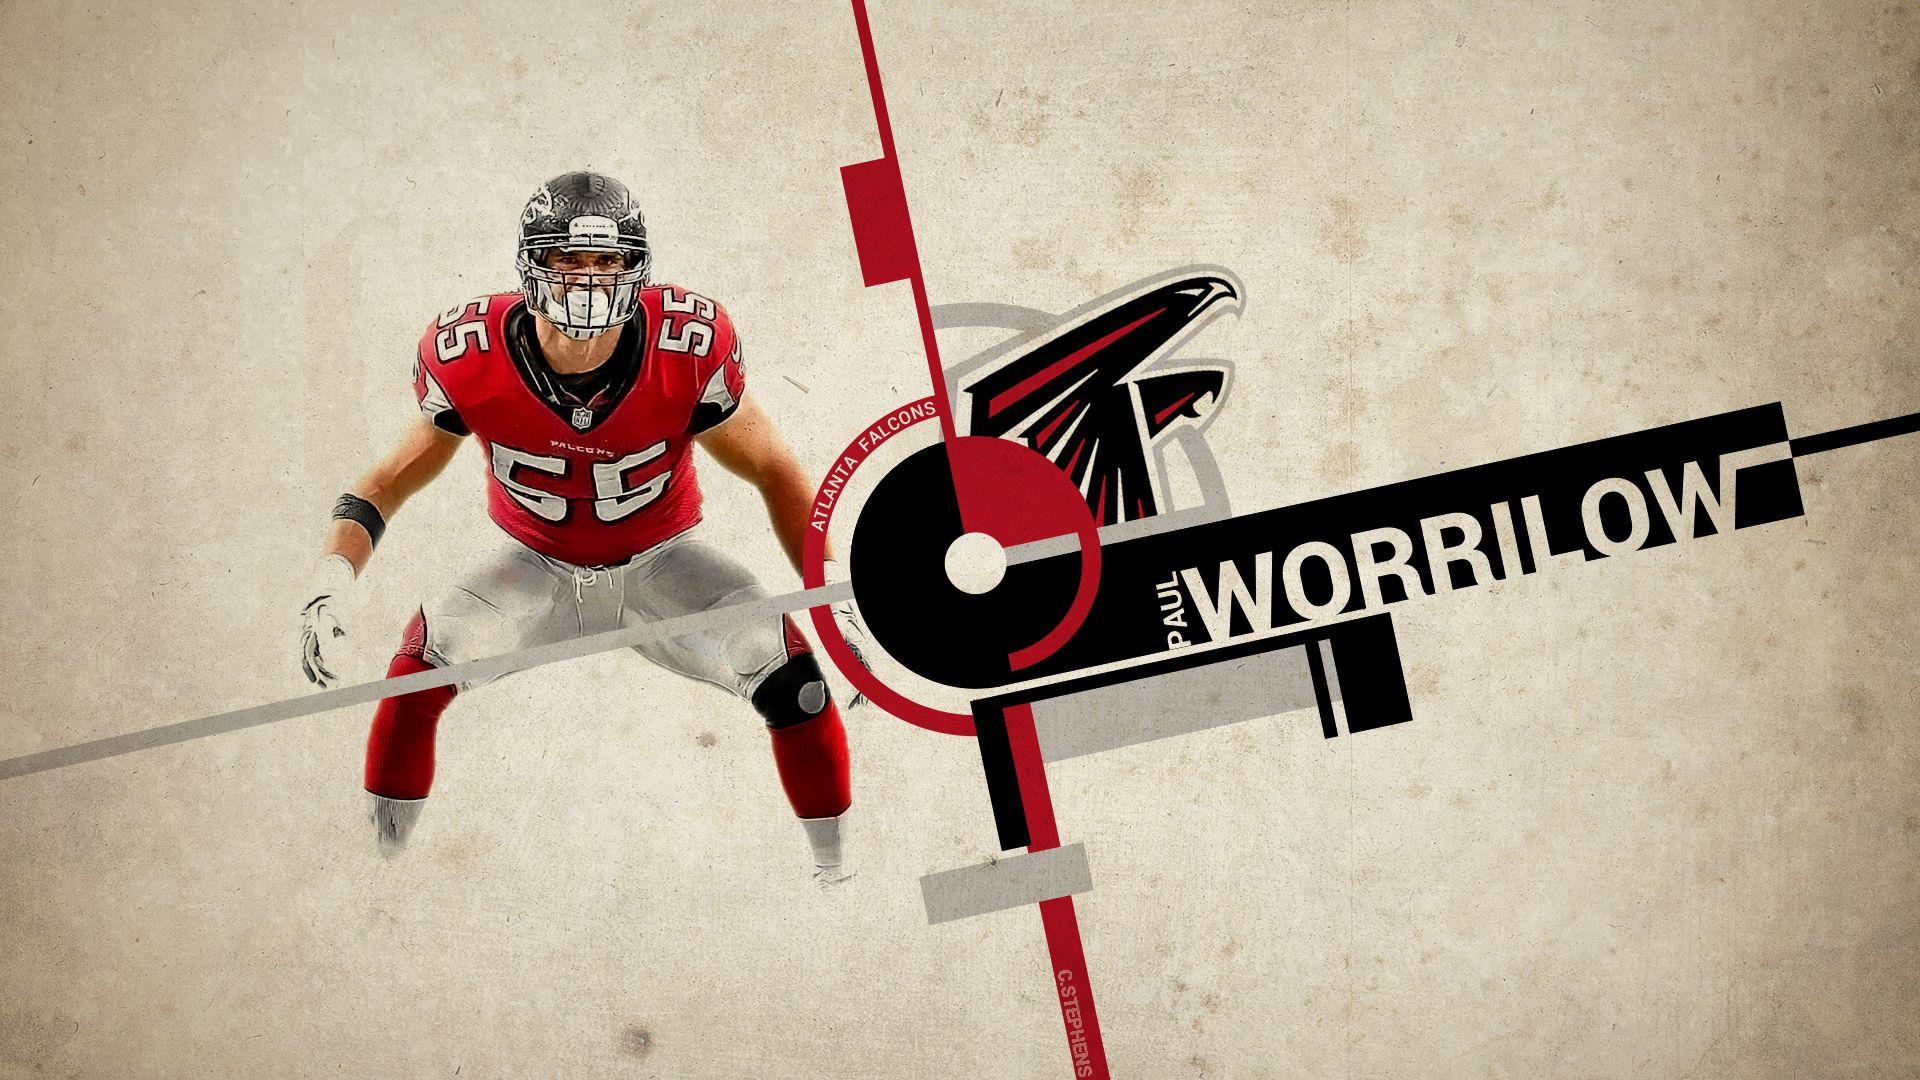 Atlanta Falcons 1080p Wallpaper